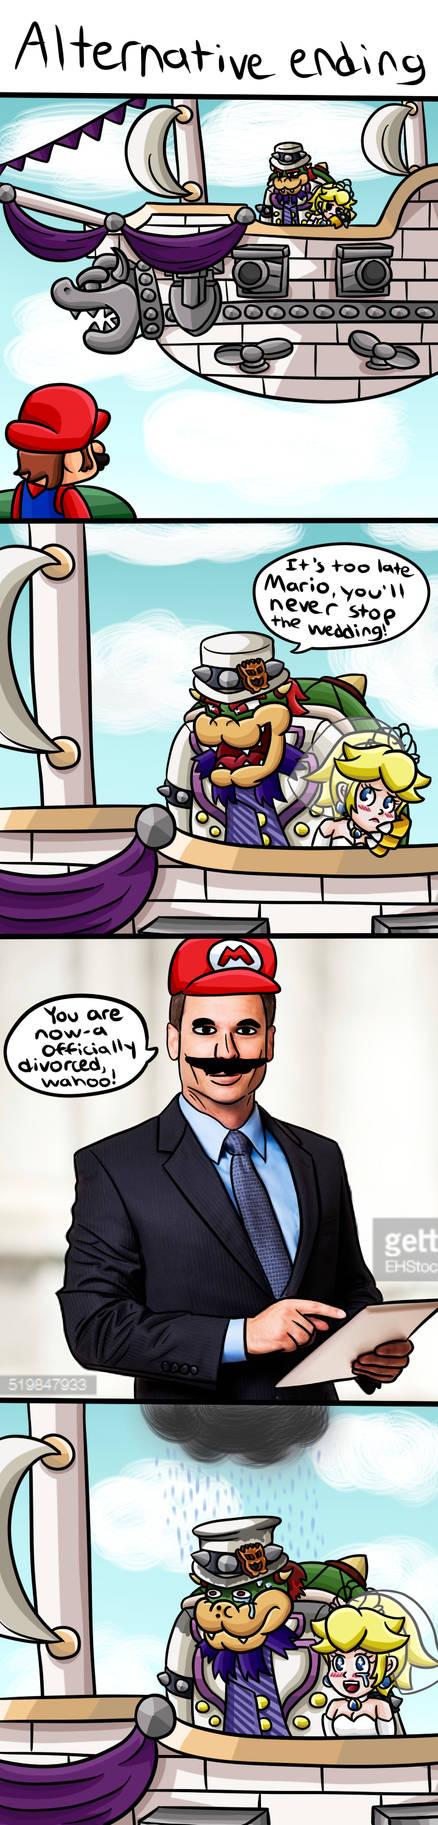 Super Mario Odyssey: Alternative Ending by 4bitscomic on